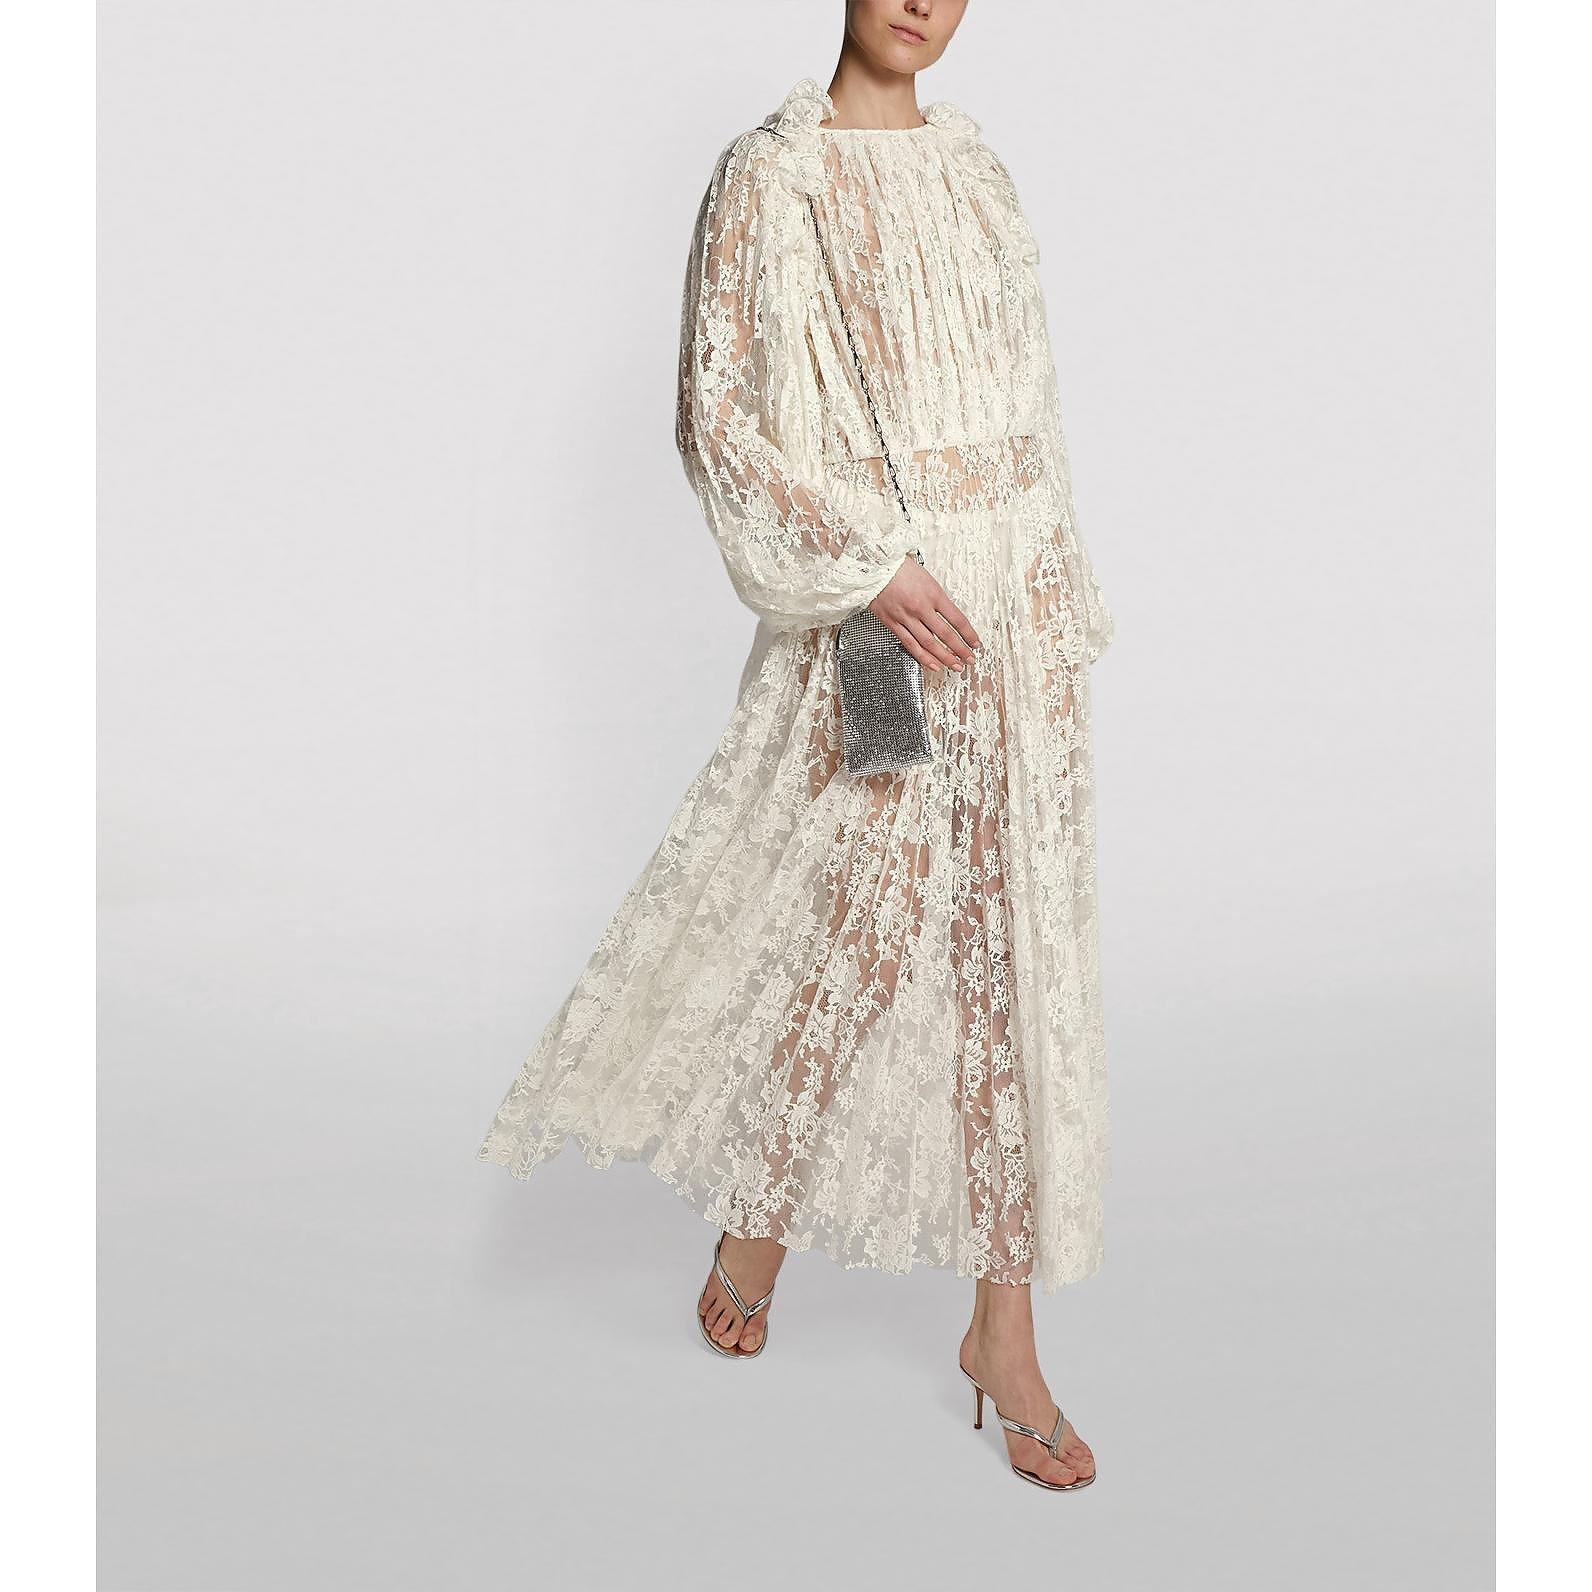 Magda Butrym Dover Lace Midi Dress